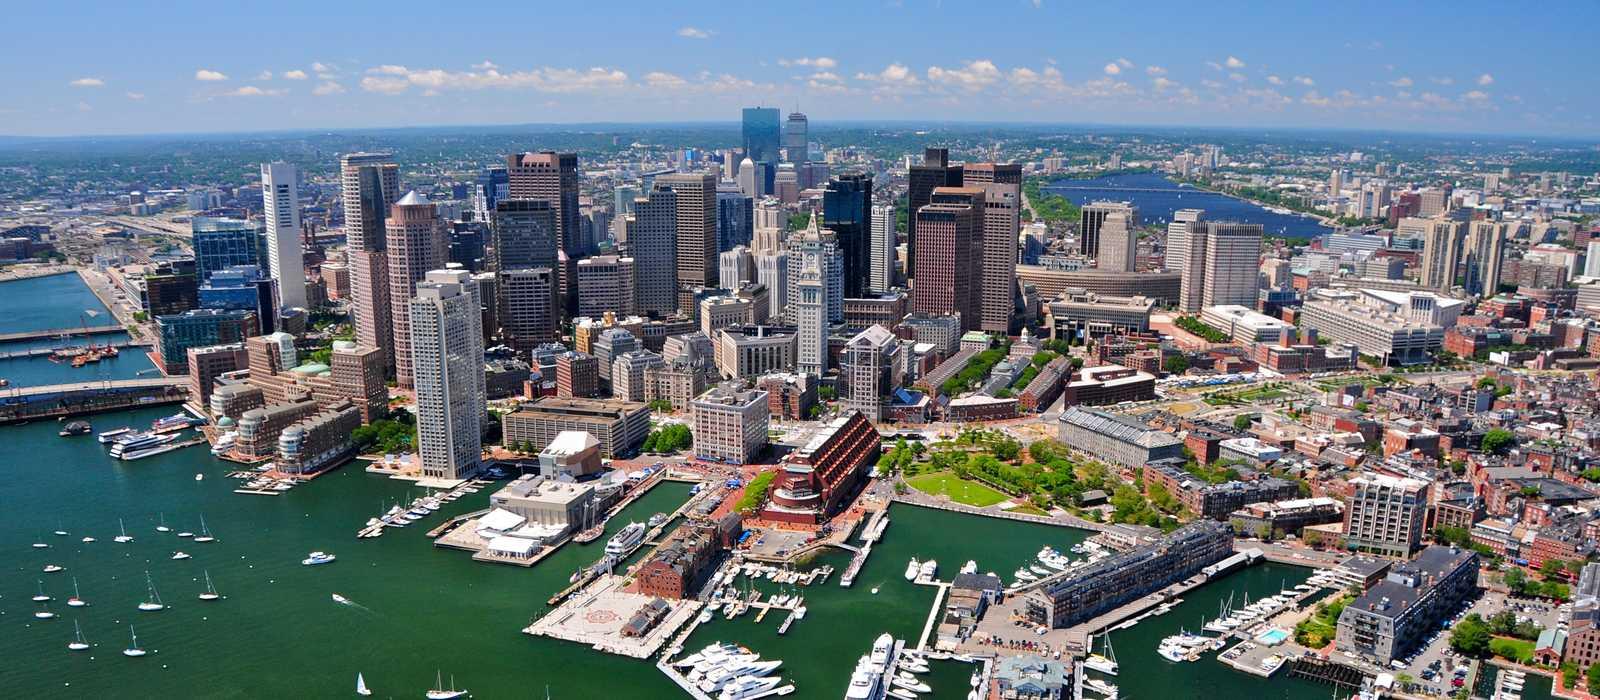 Luftaufnahme von Boston, Massachusetts